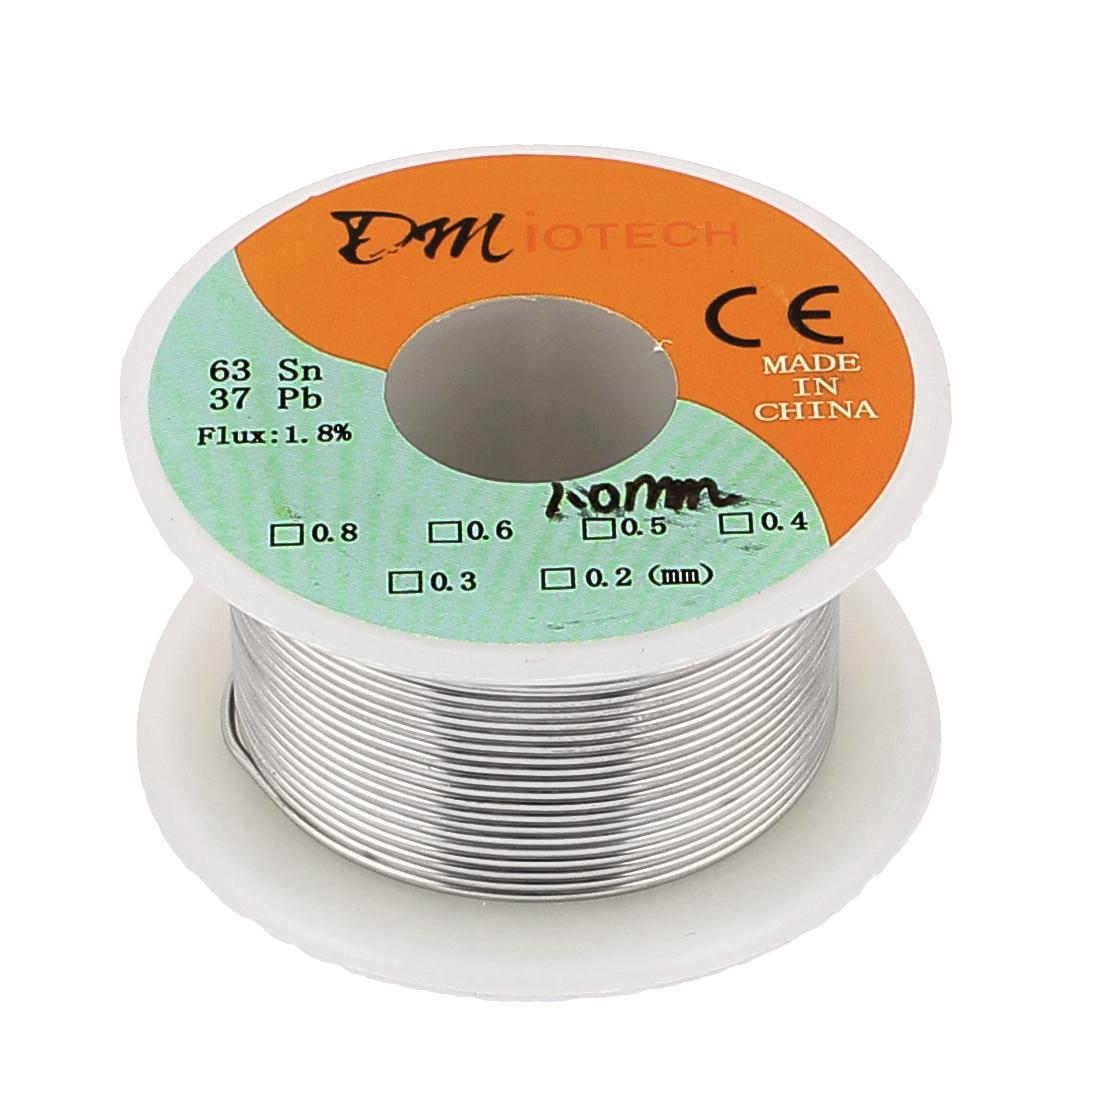 DMiotech 1mm 35G 63/37 Rosin Core Flux 1.8% Tin  Roll Soldering Solder Wire